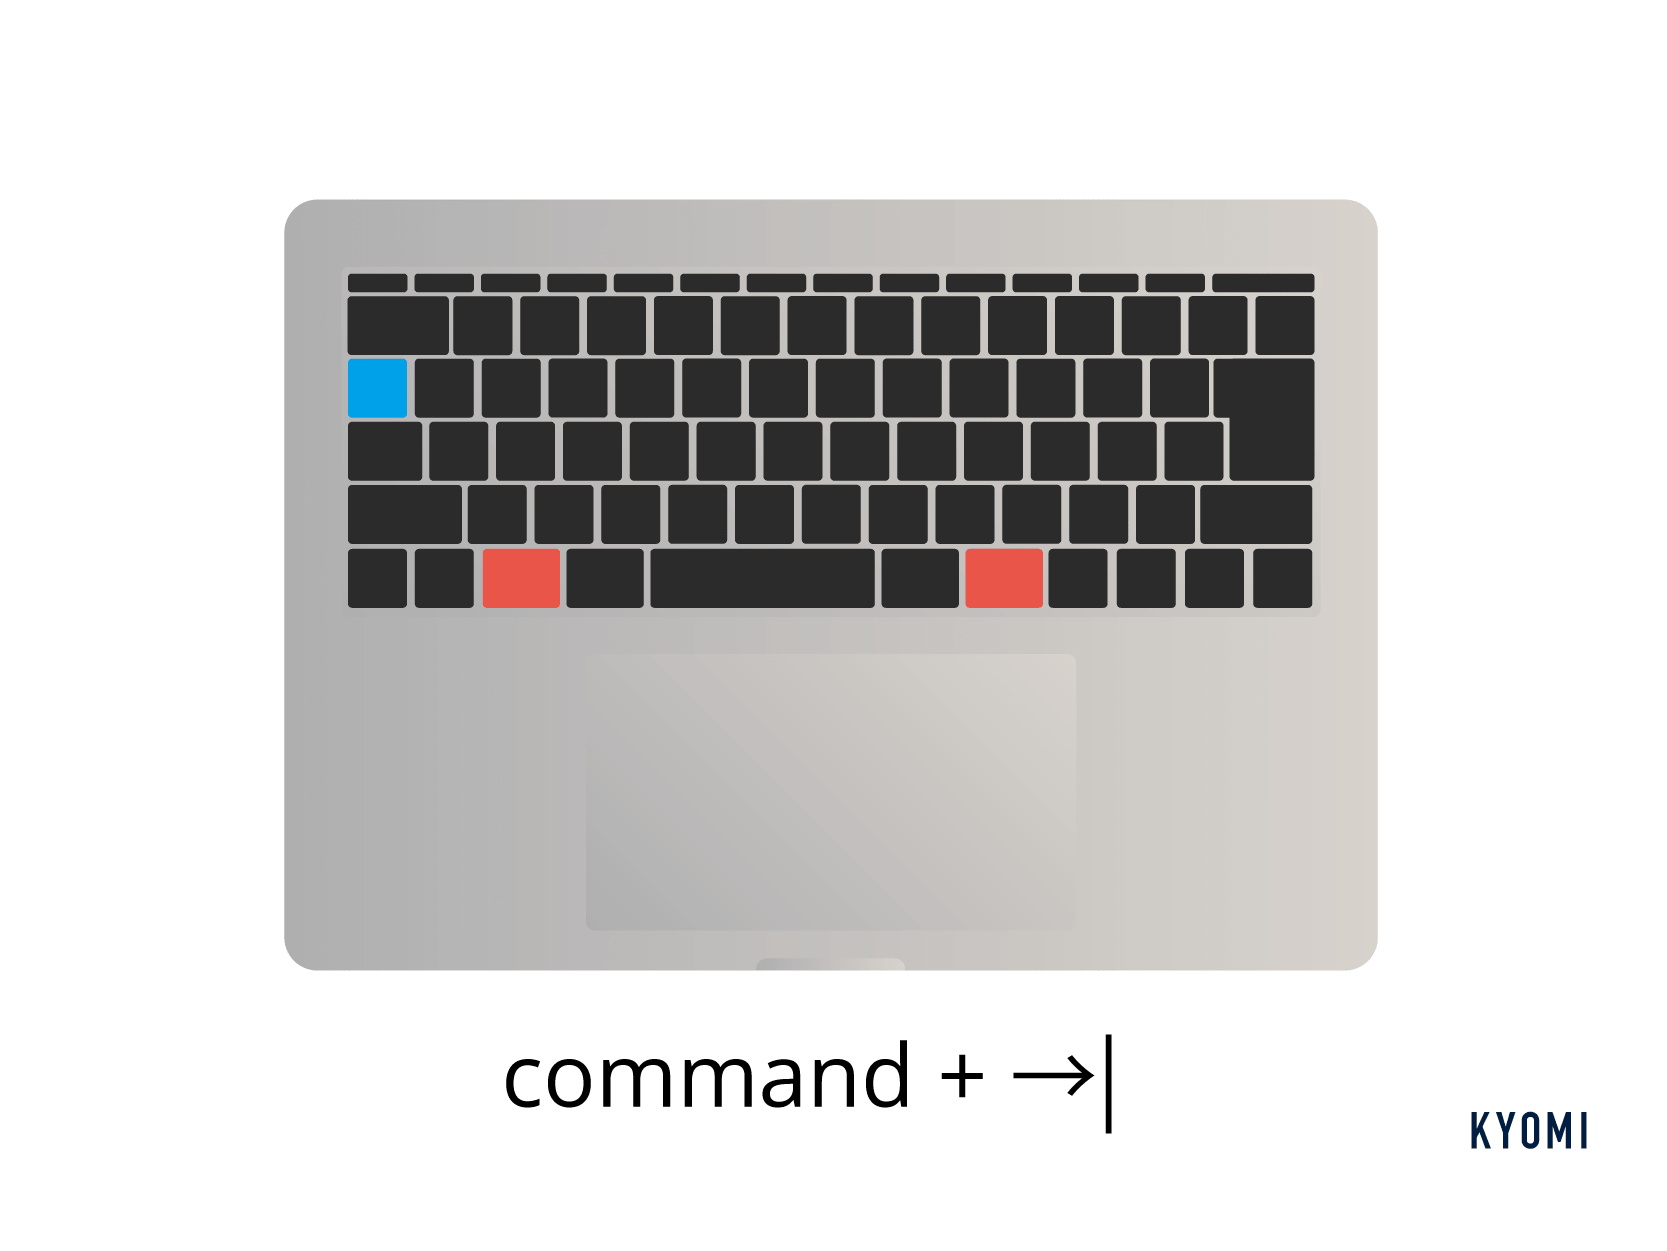 macキーボードショートカット種類-アプリ一覧表示